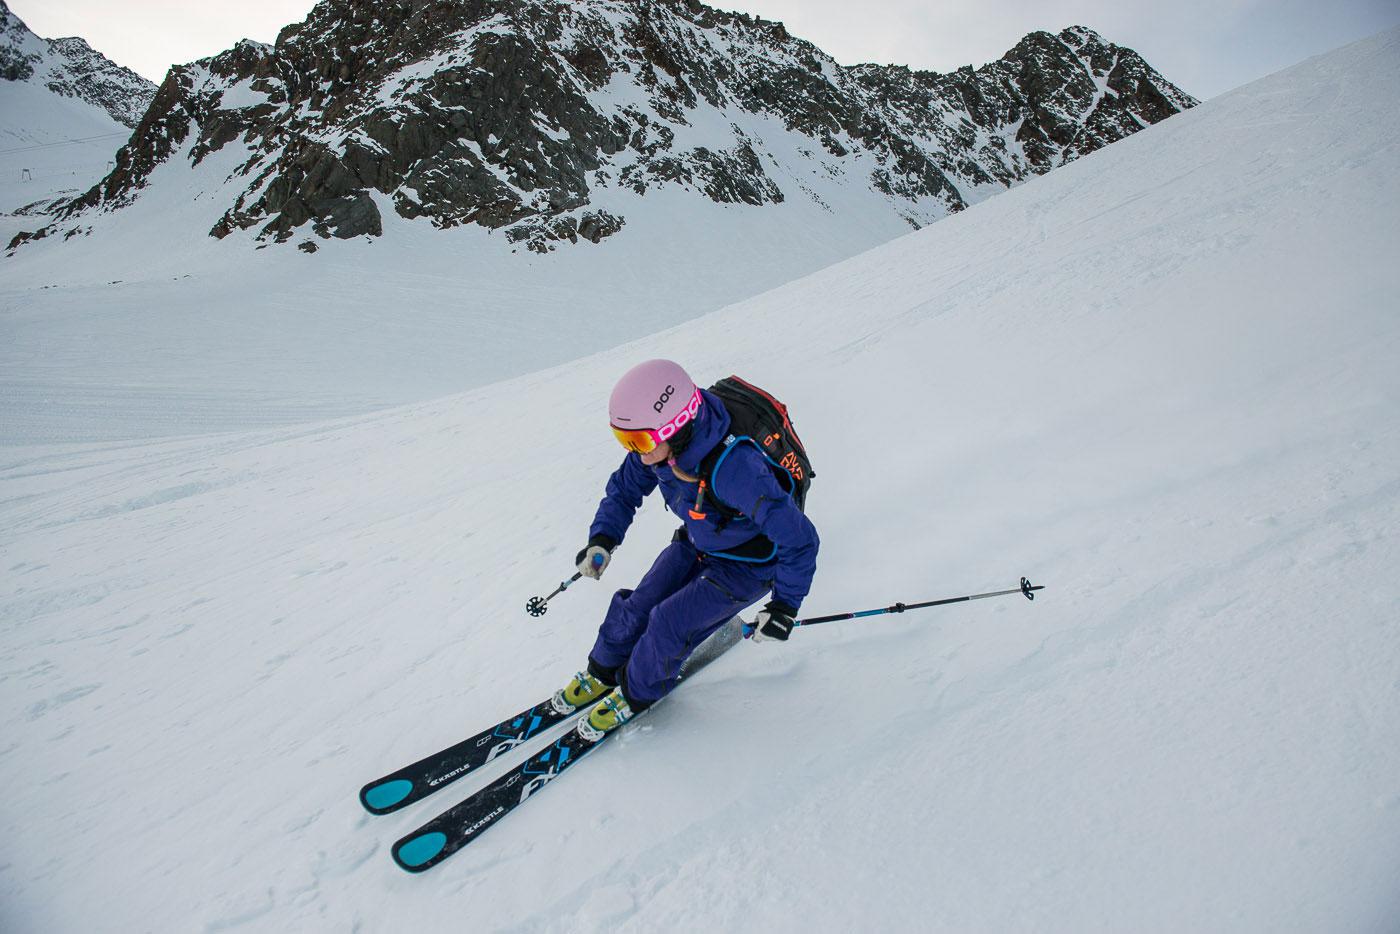 packliste-skifahren-munich-mountain-girls-katharina-kestler